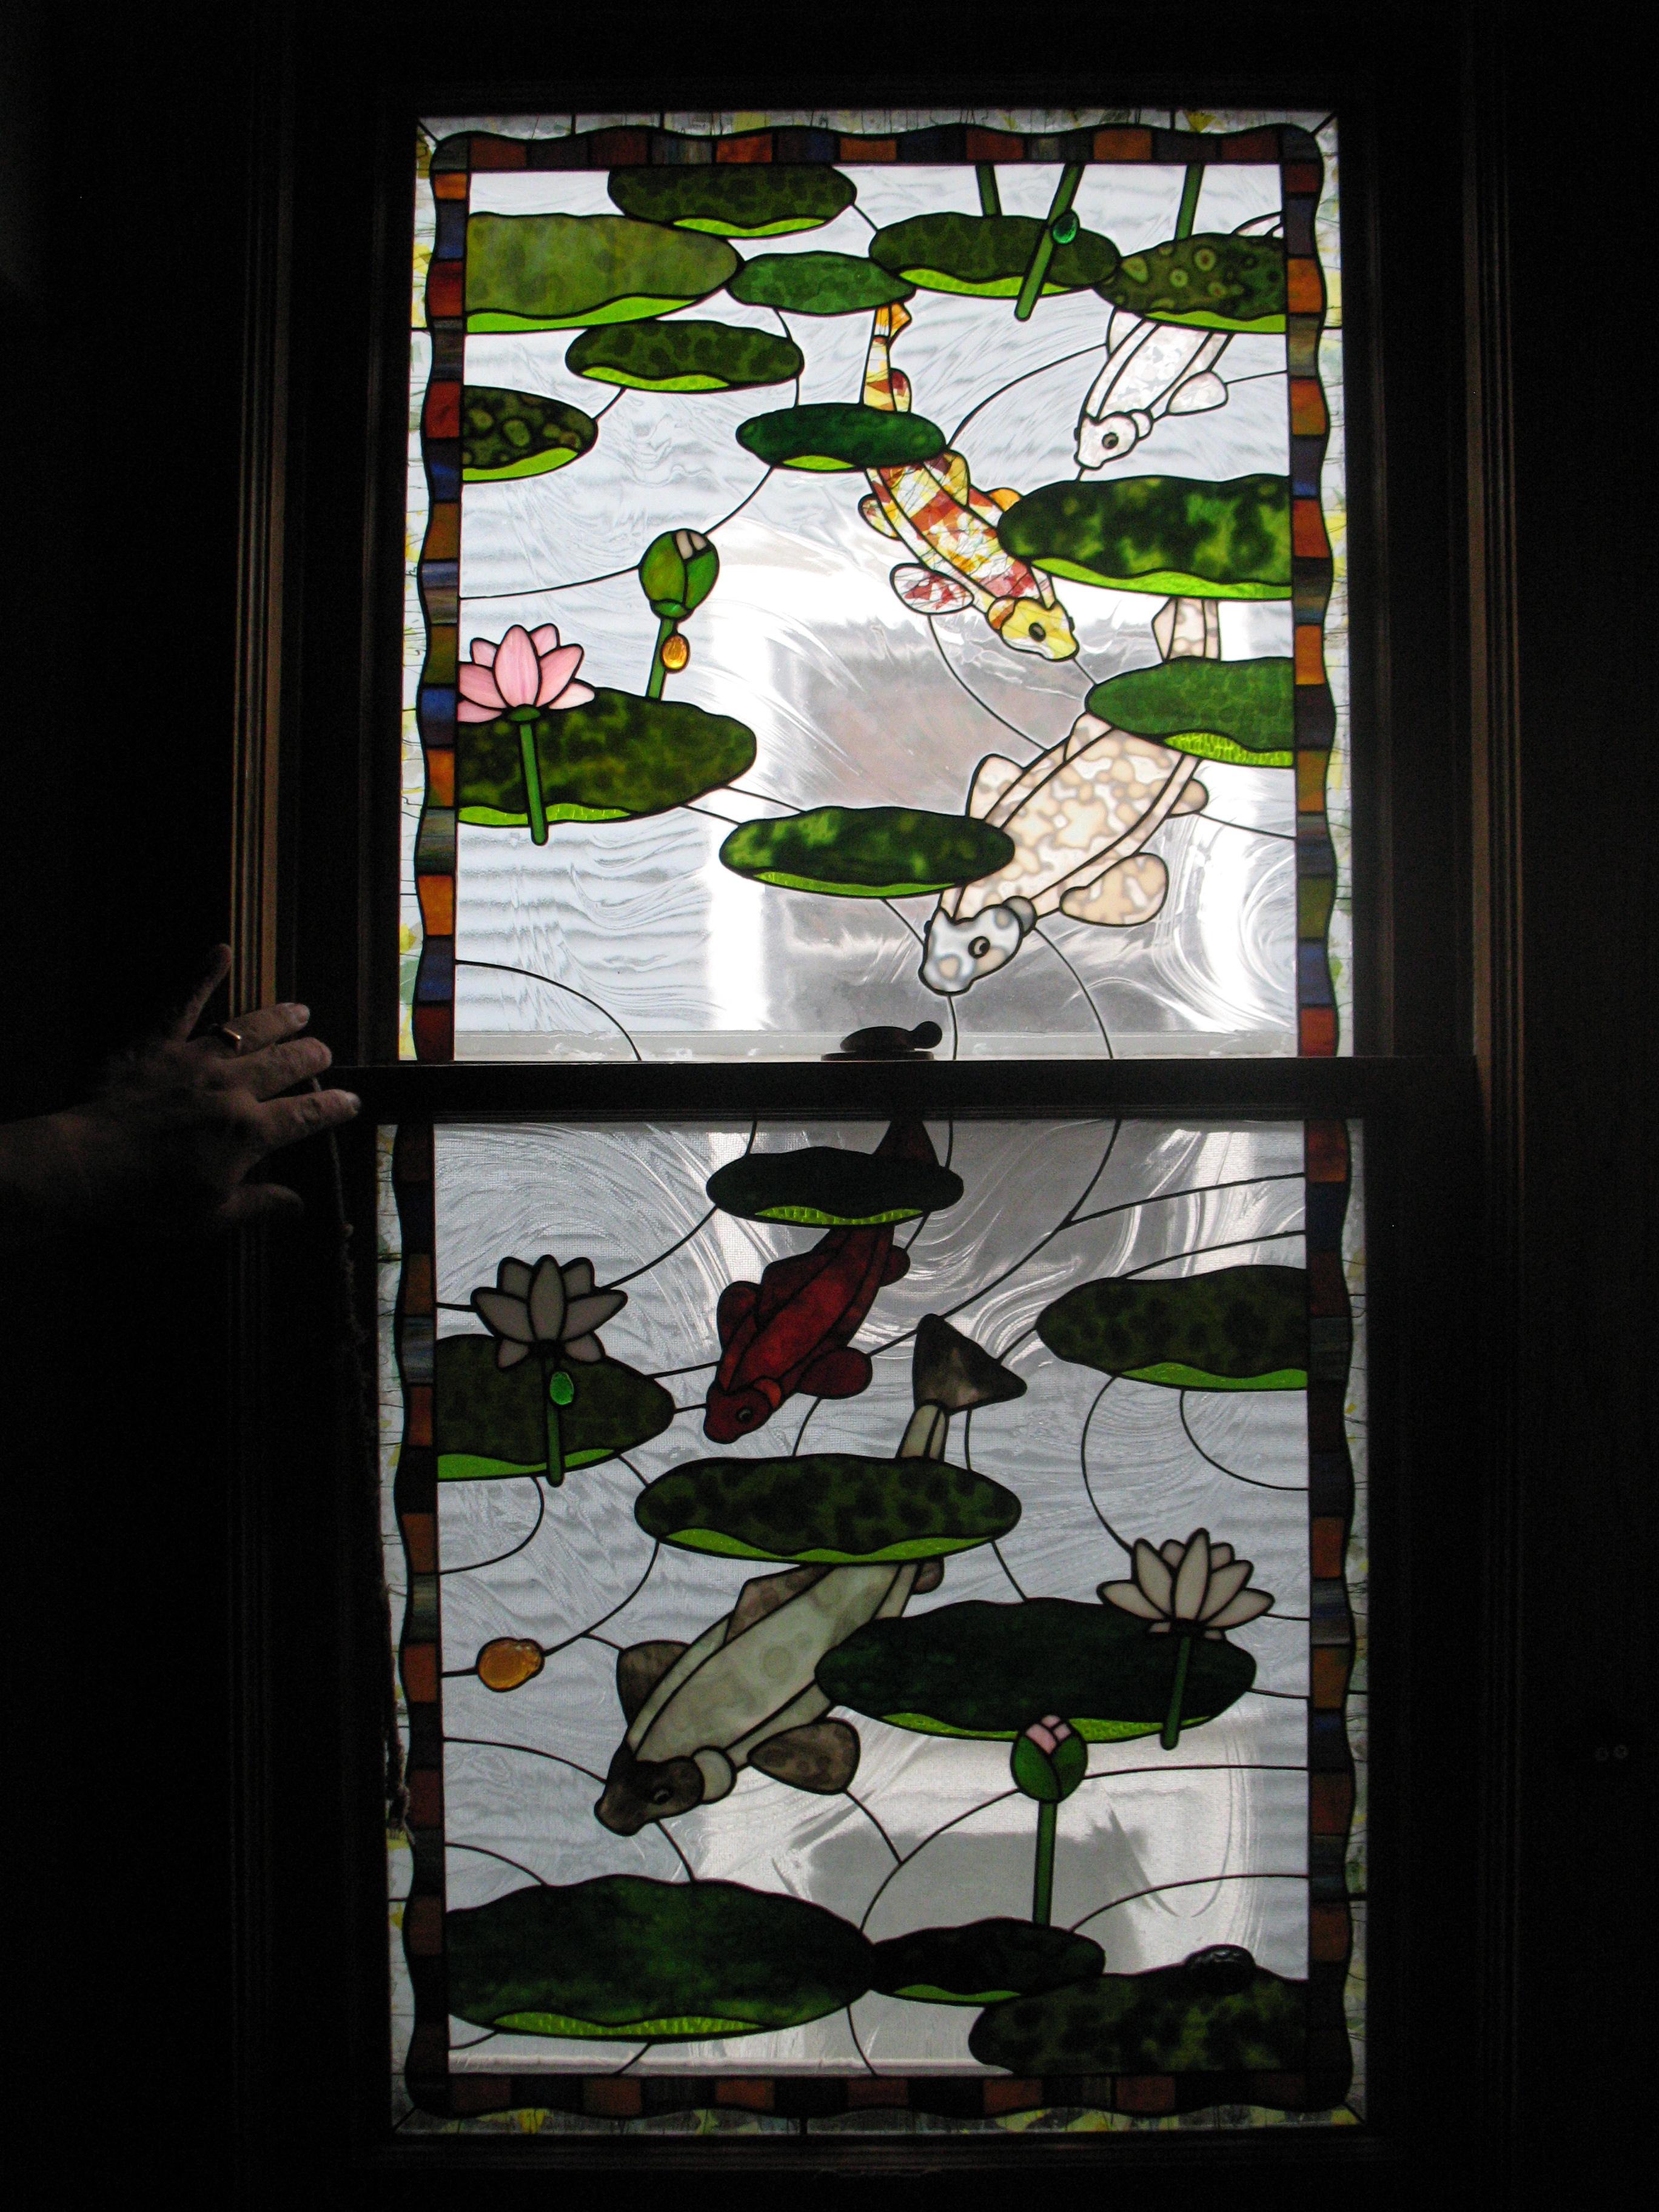 Michael Lizama: Through the Looking Glass